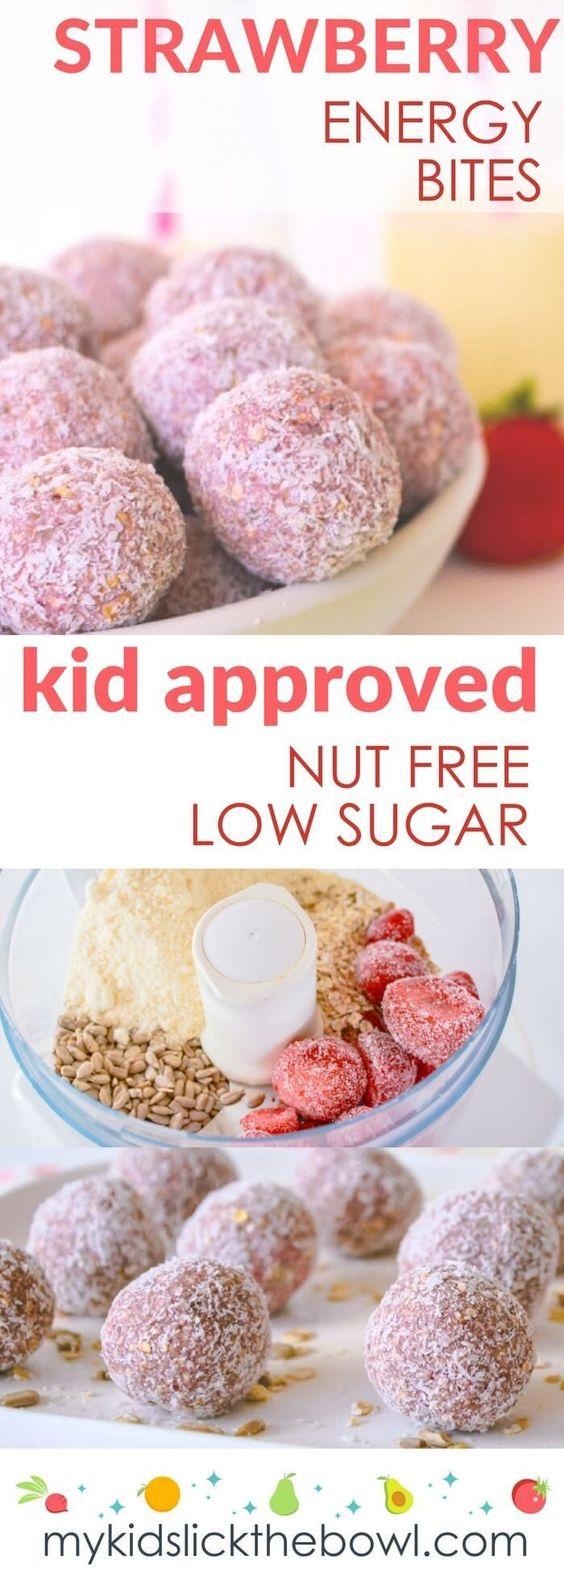 Strawberry Breakfast Bites #strawberry #breakfast #breakfastideas #bites #healthysnack #healthysnackideas #healthyfood #healthyrecipes